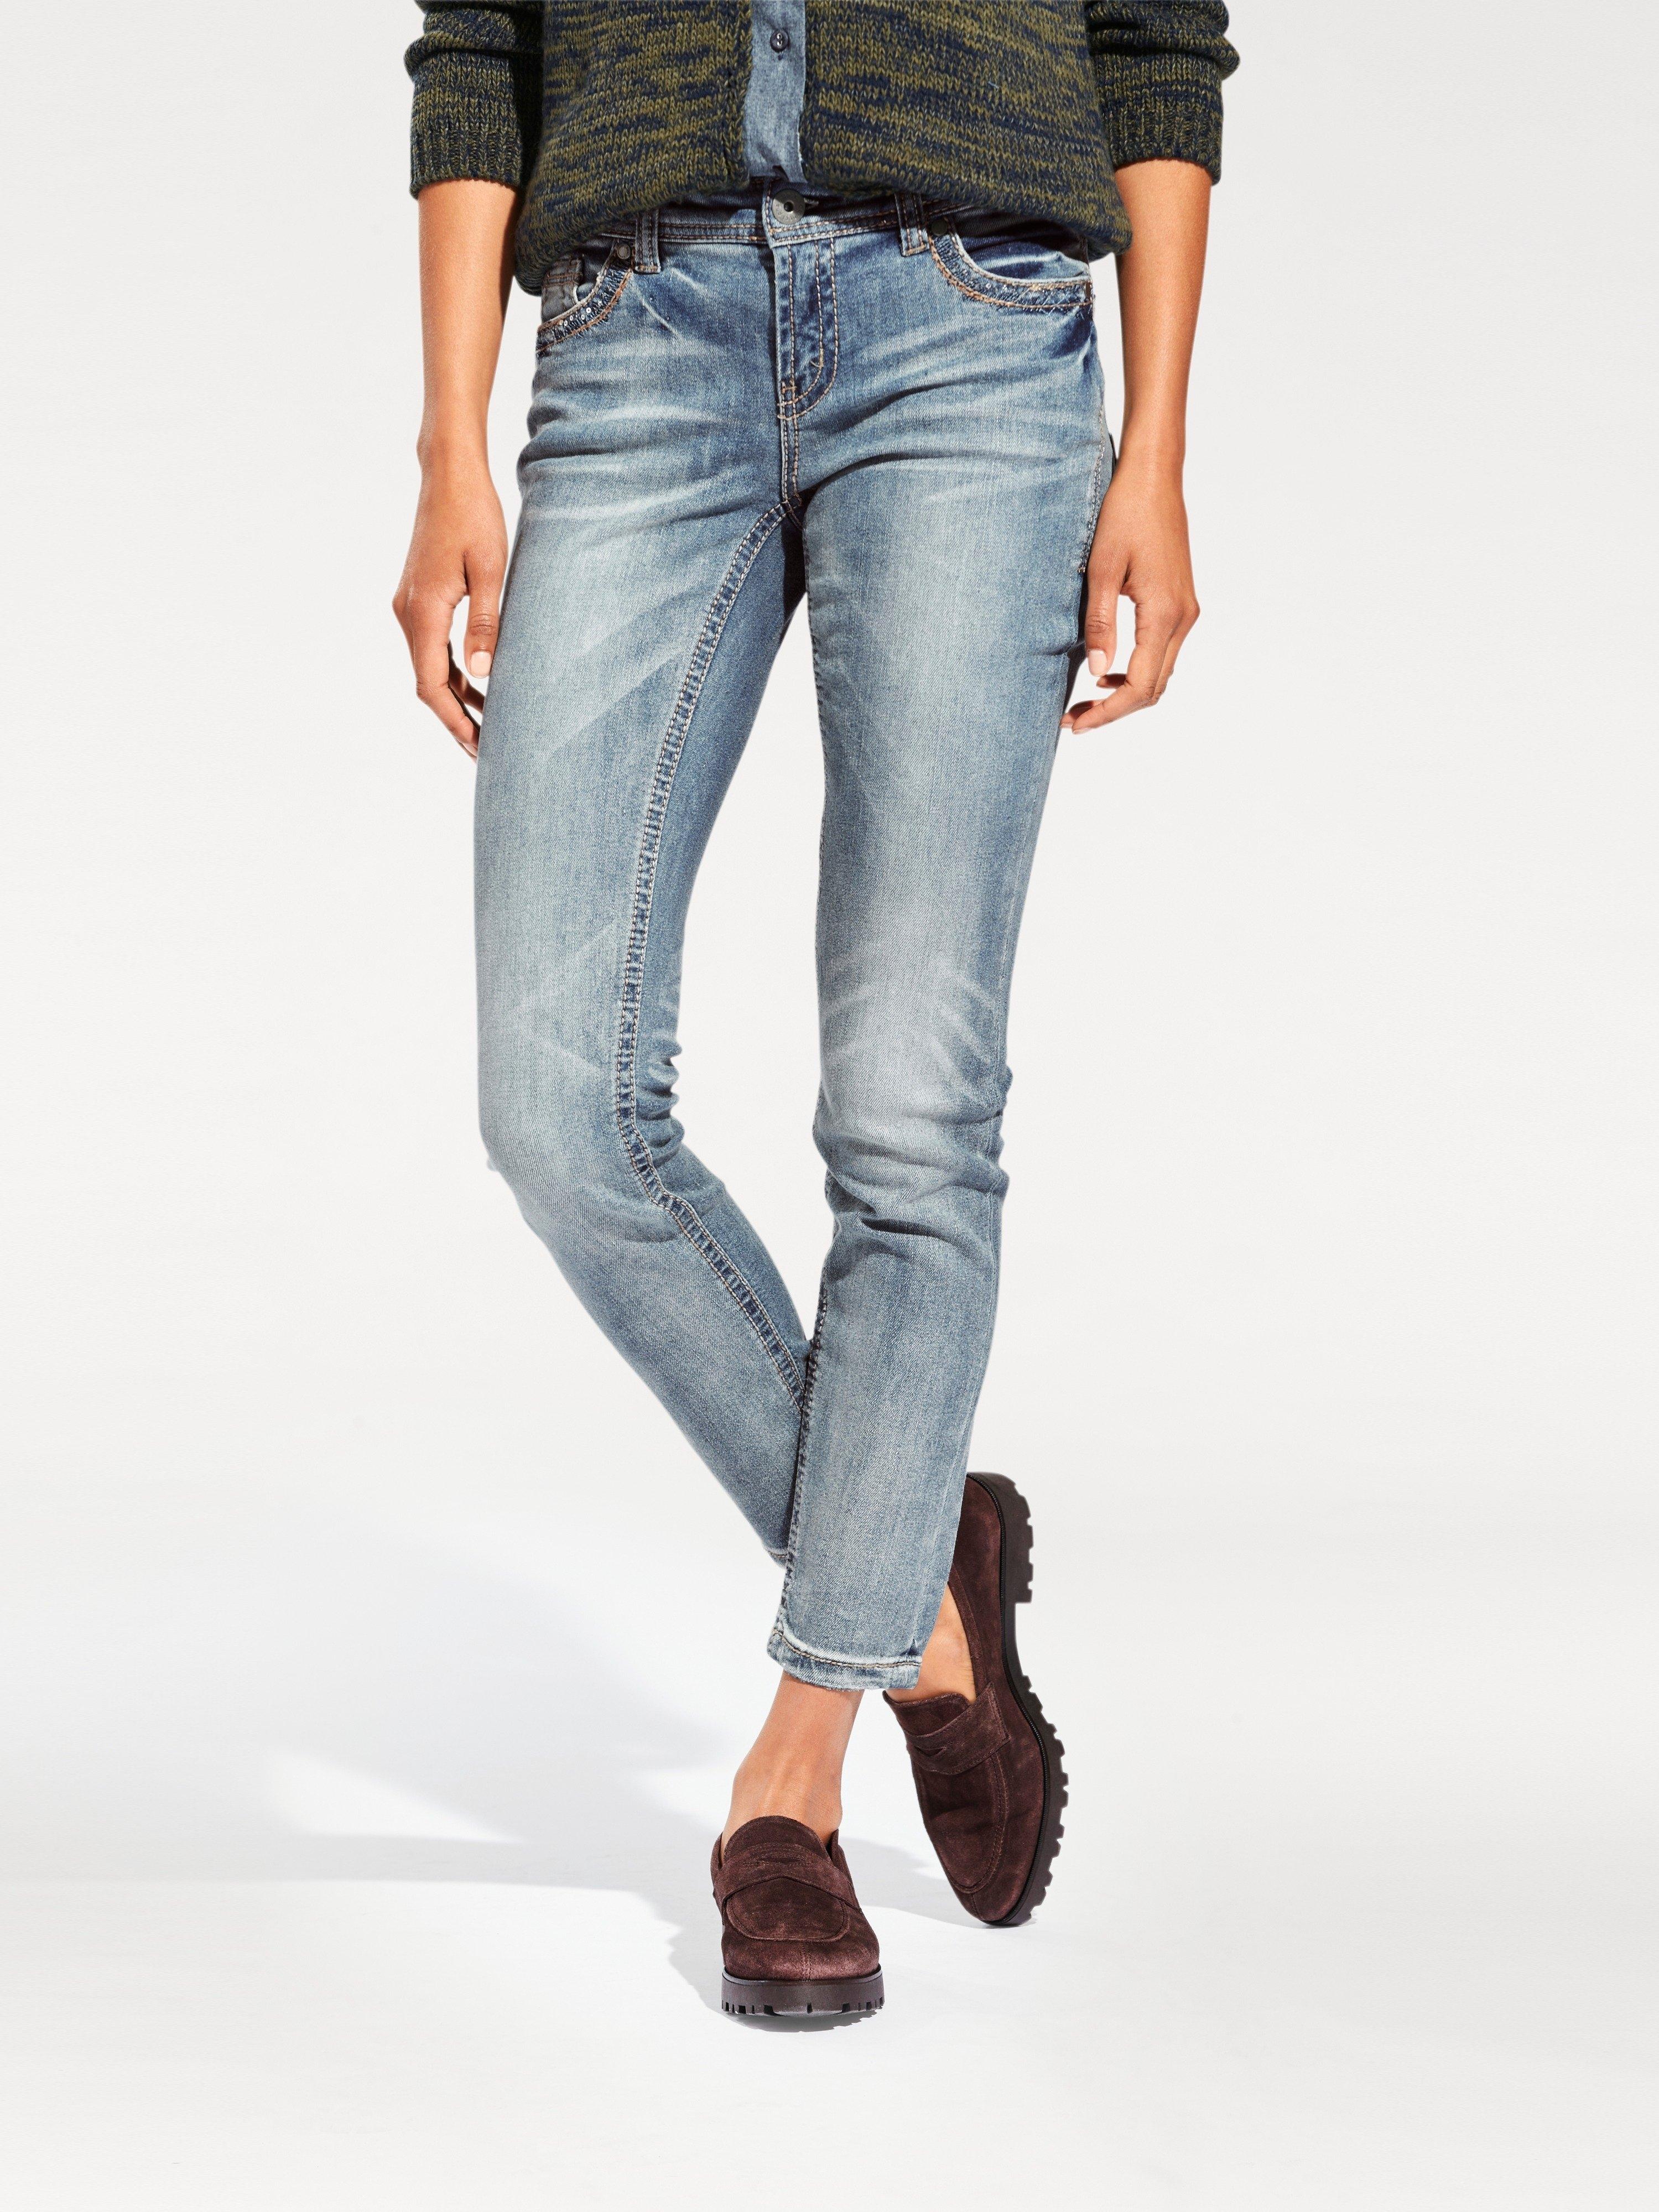 jeans Makkelijk Skinny jeans Gevonden Skinny WD2EIH9Y